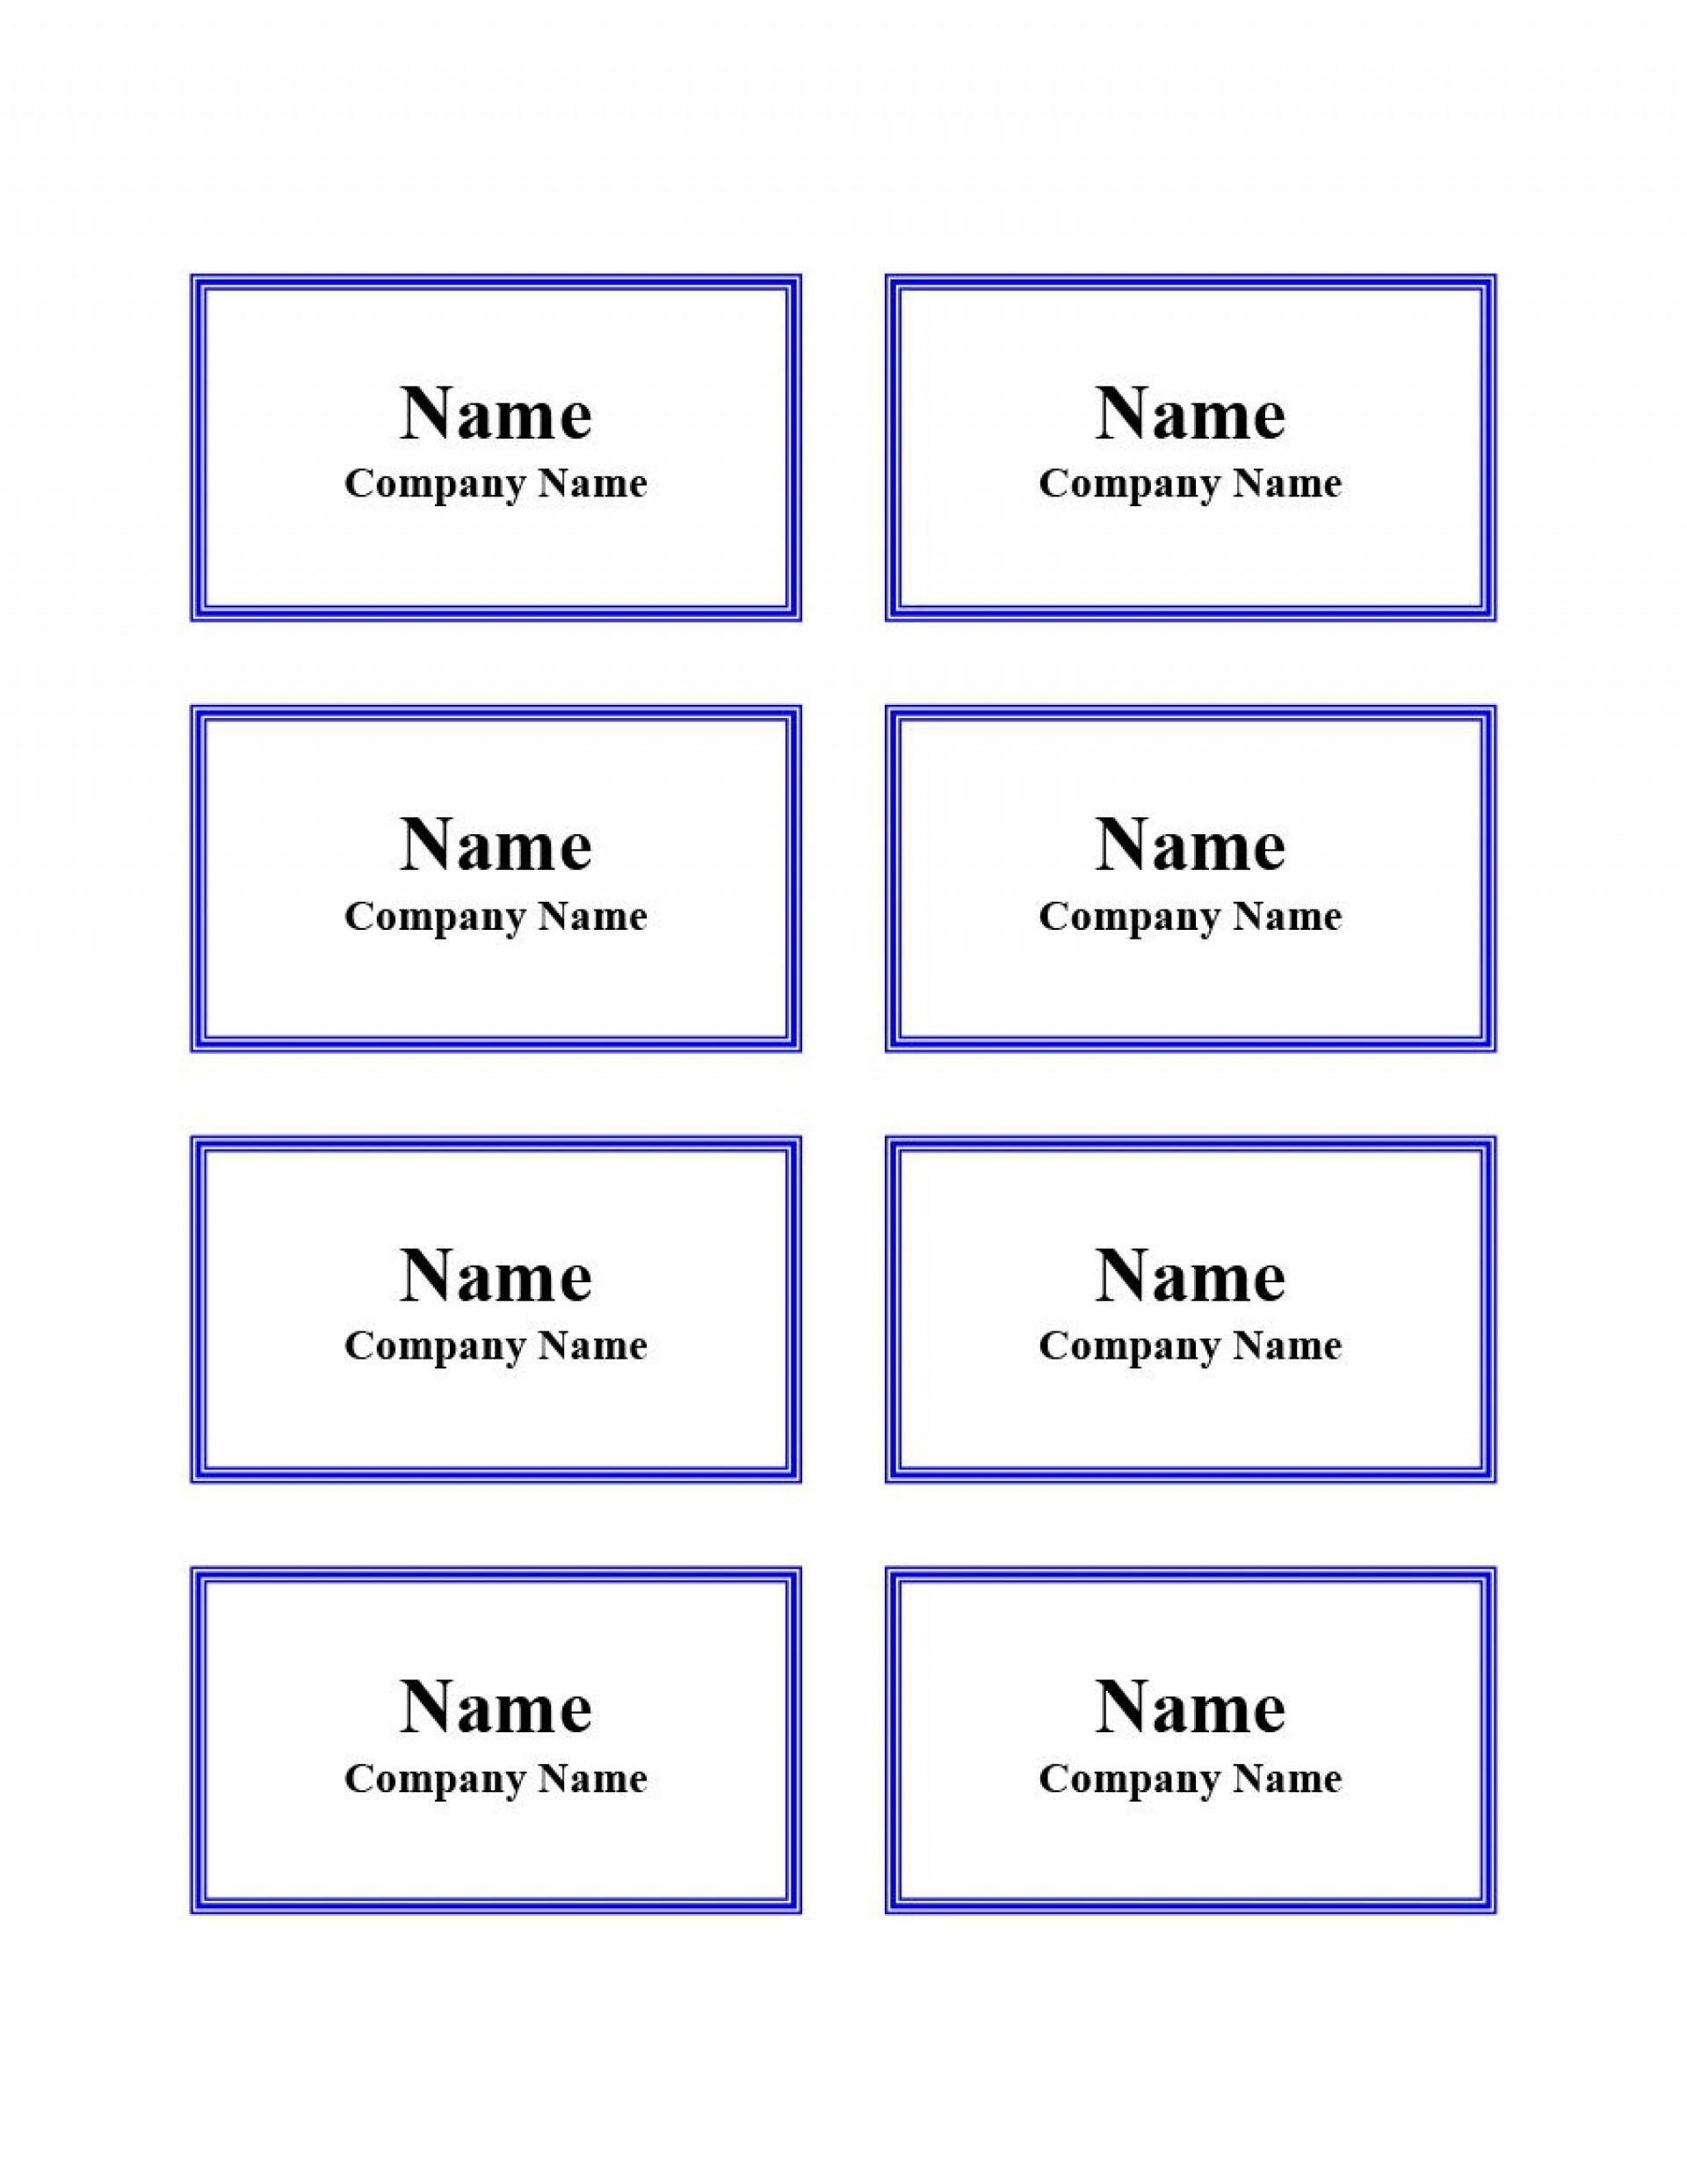 011 Striking Name Badge Template Word Sample  Free Download 2010 Avery 53921920